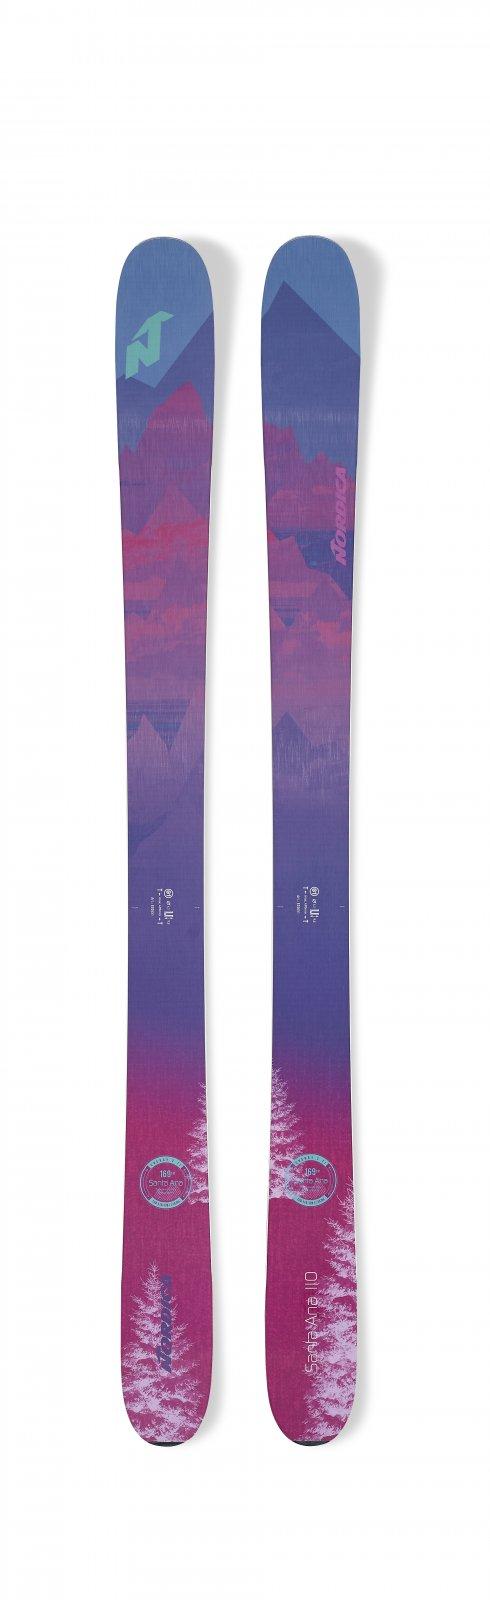 Nordica Santa Ana 110 Skis 2020